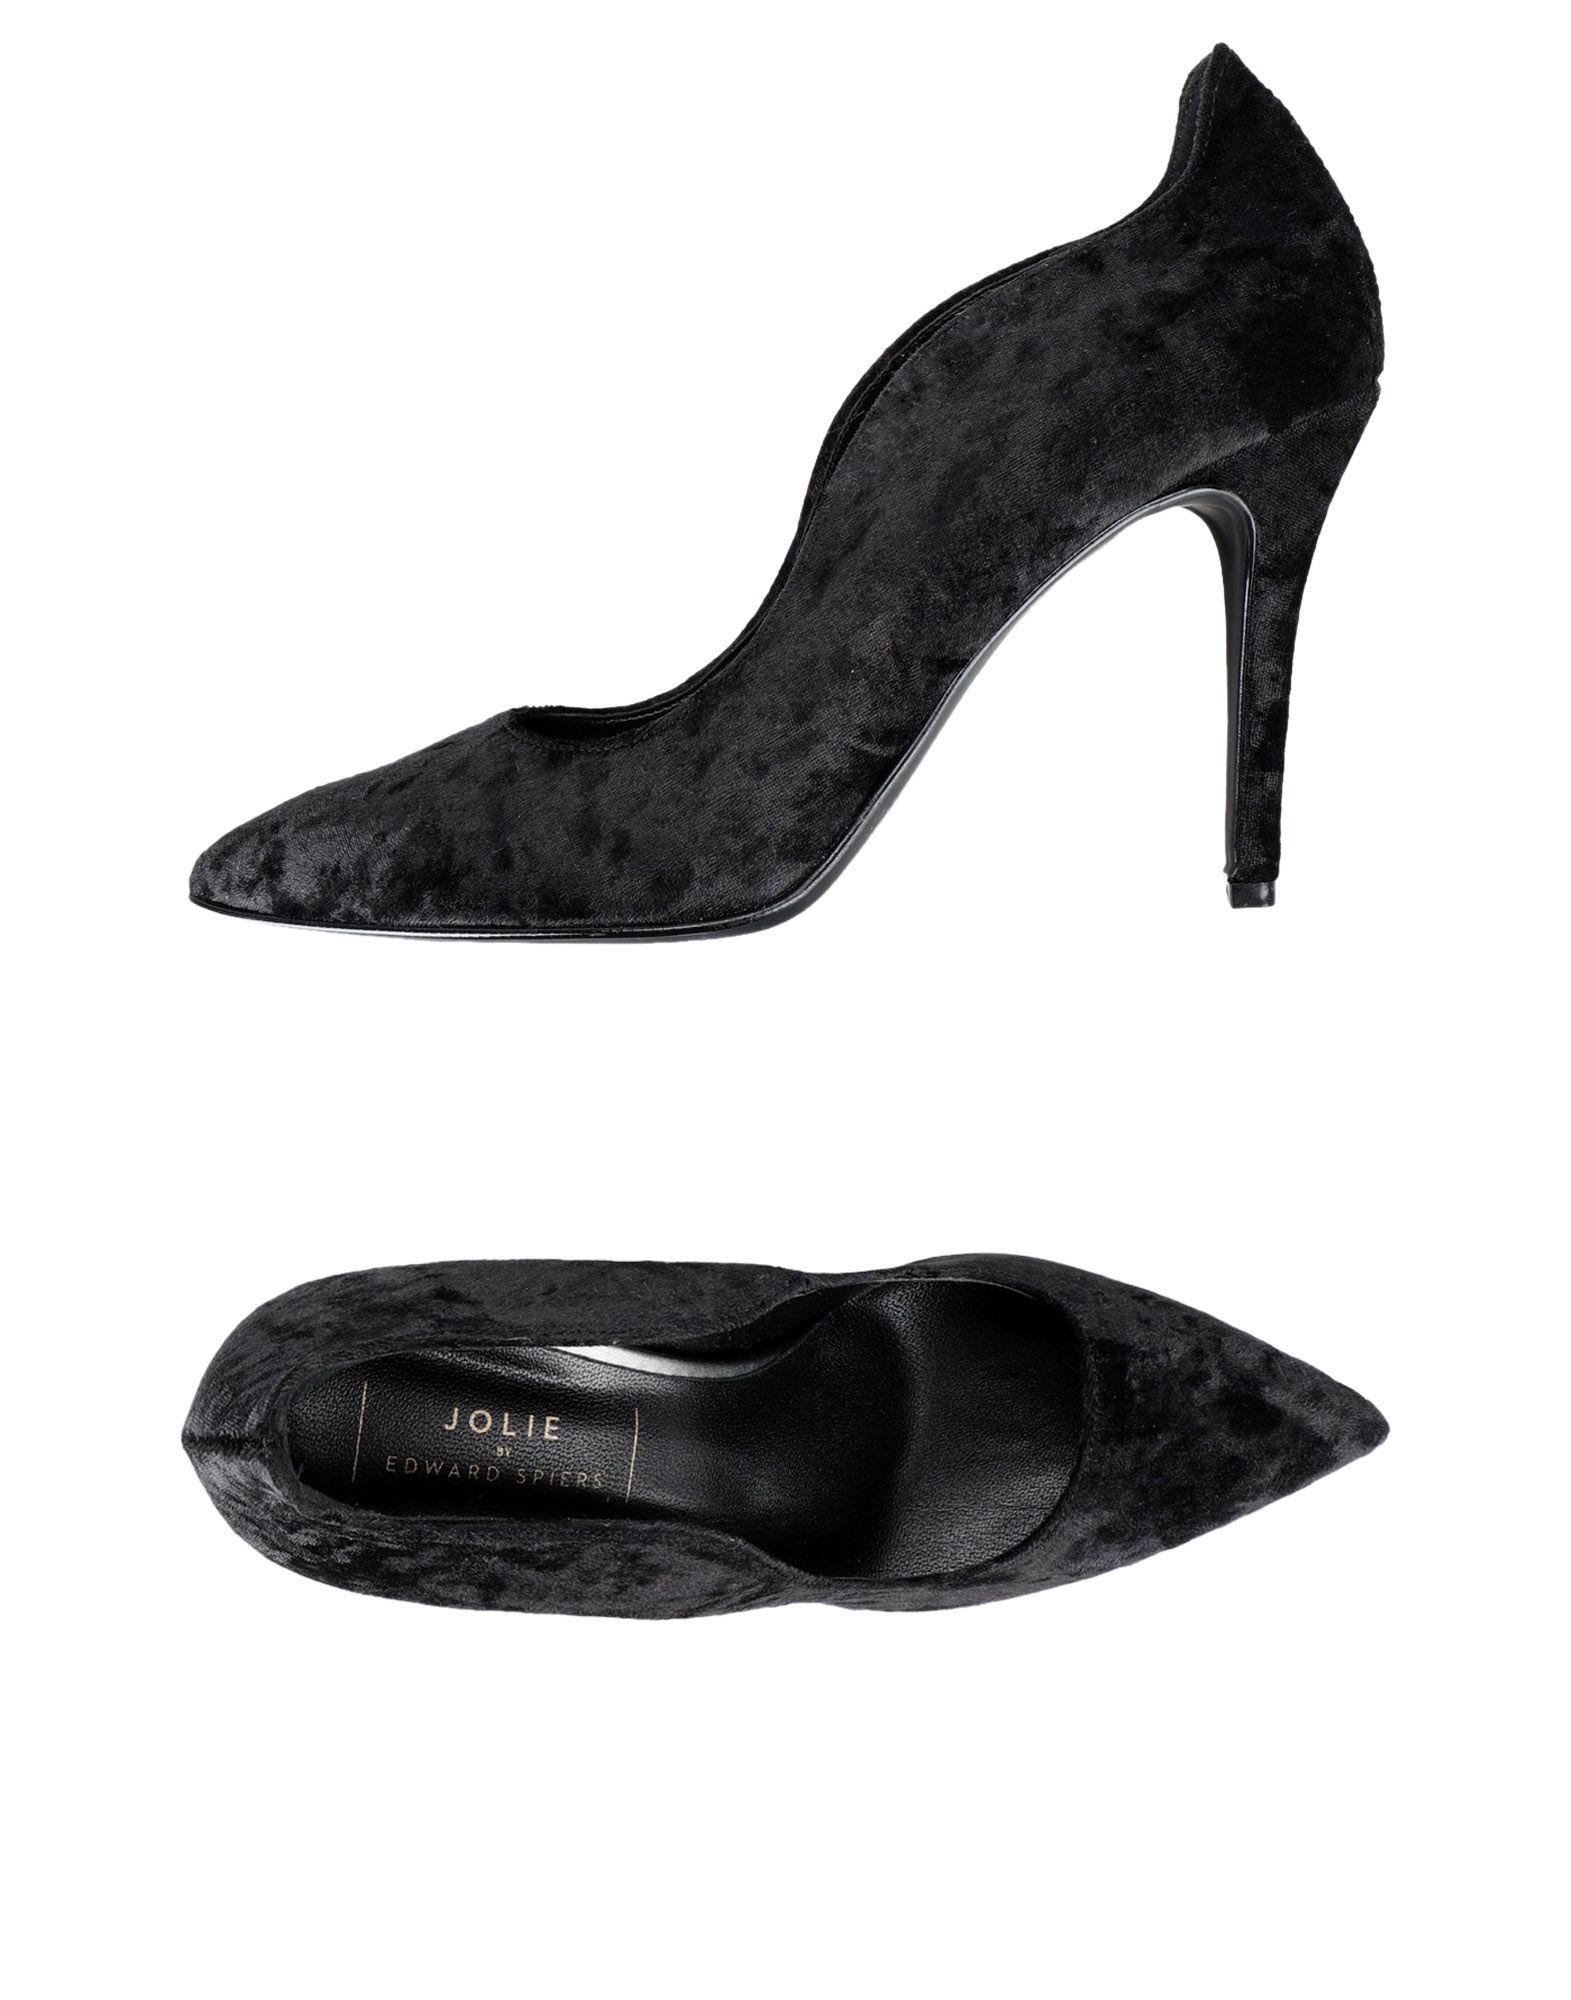 Jolie By Qualität Edward Spiers Pumps Damen  11540011TN Gute Qualität By beliebte Schuhe 119fba